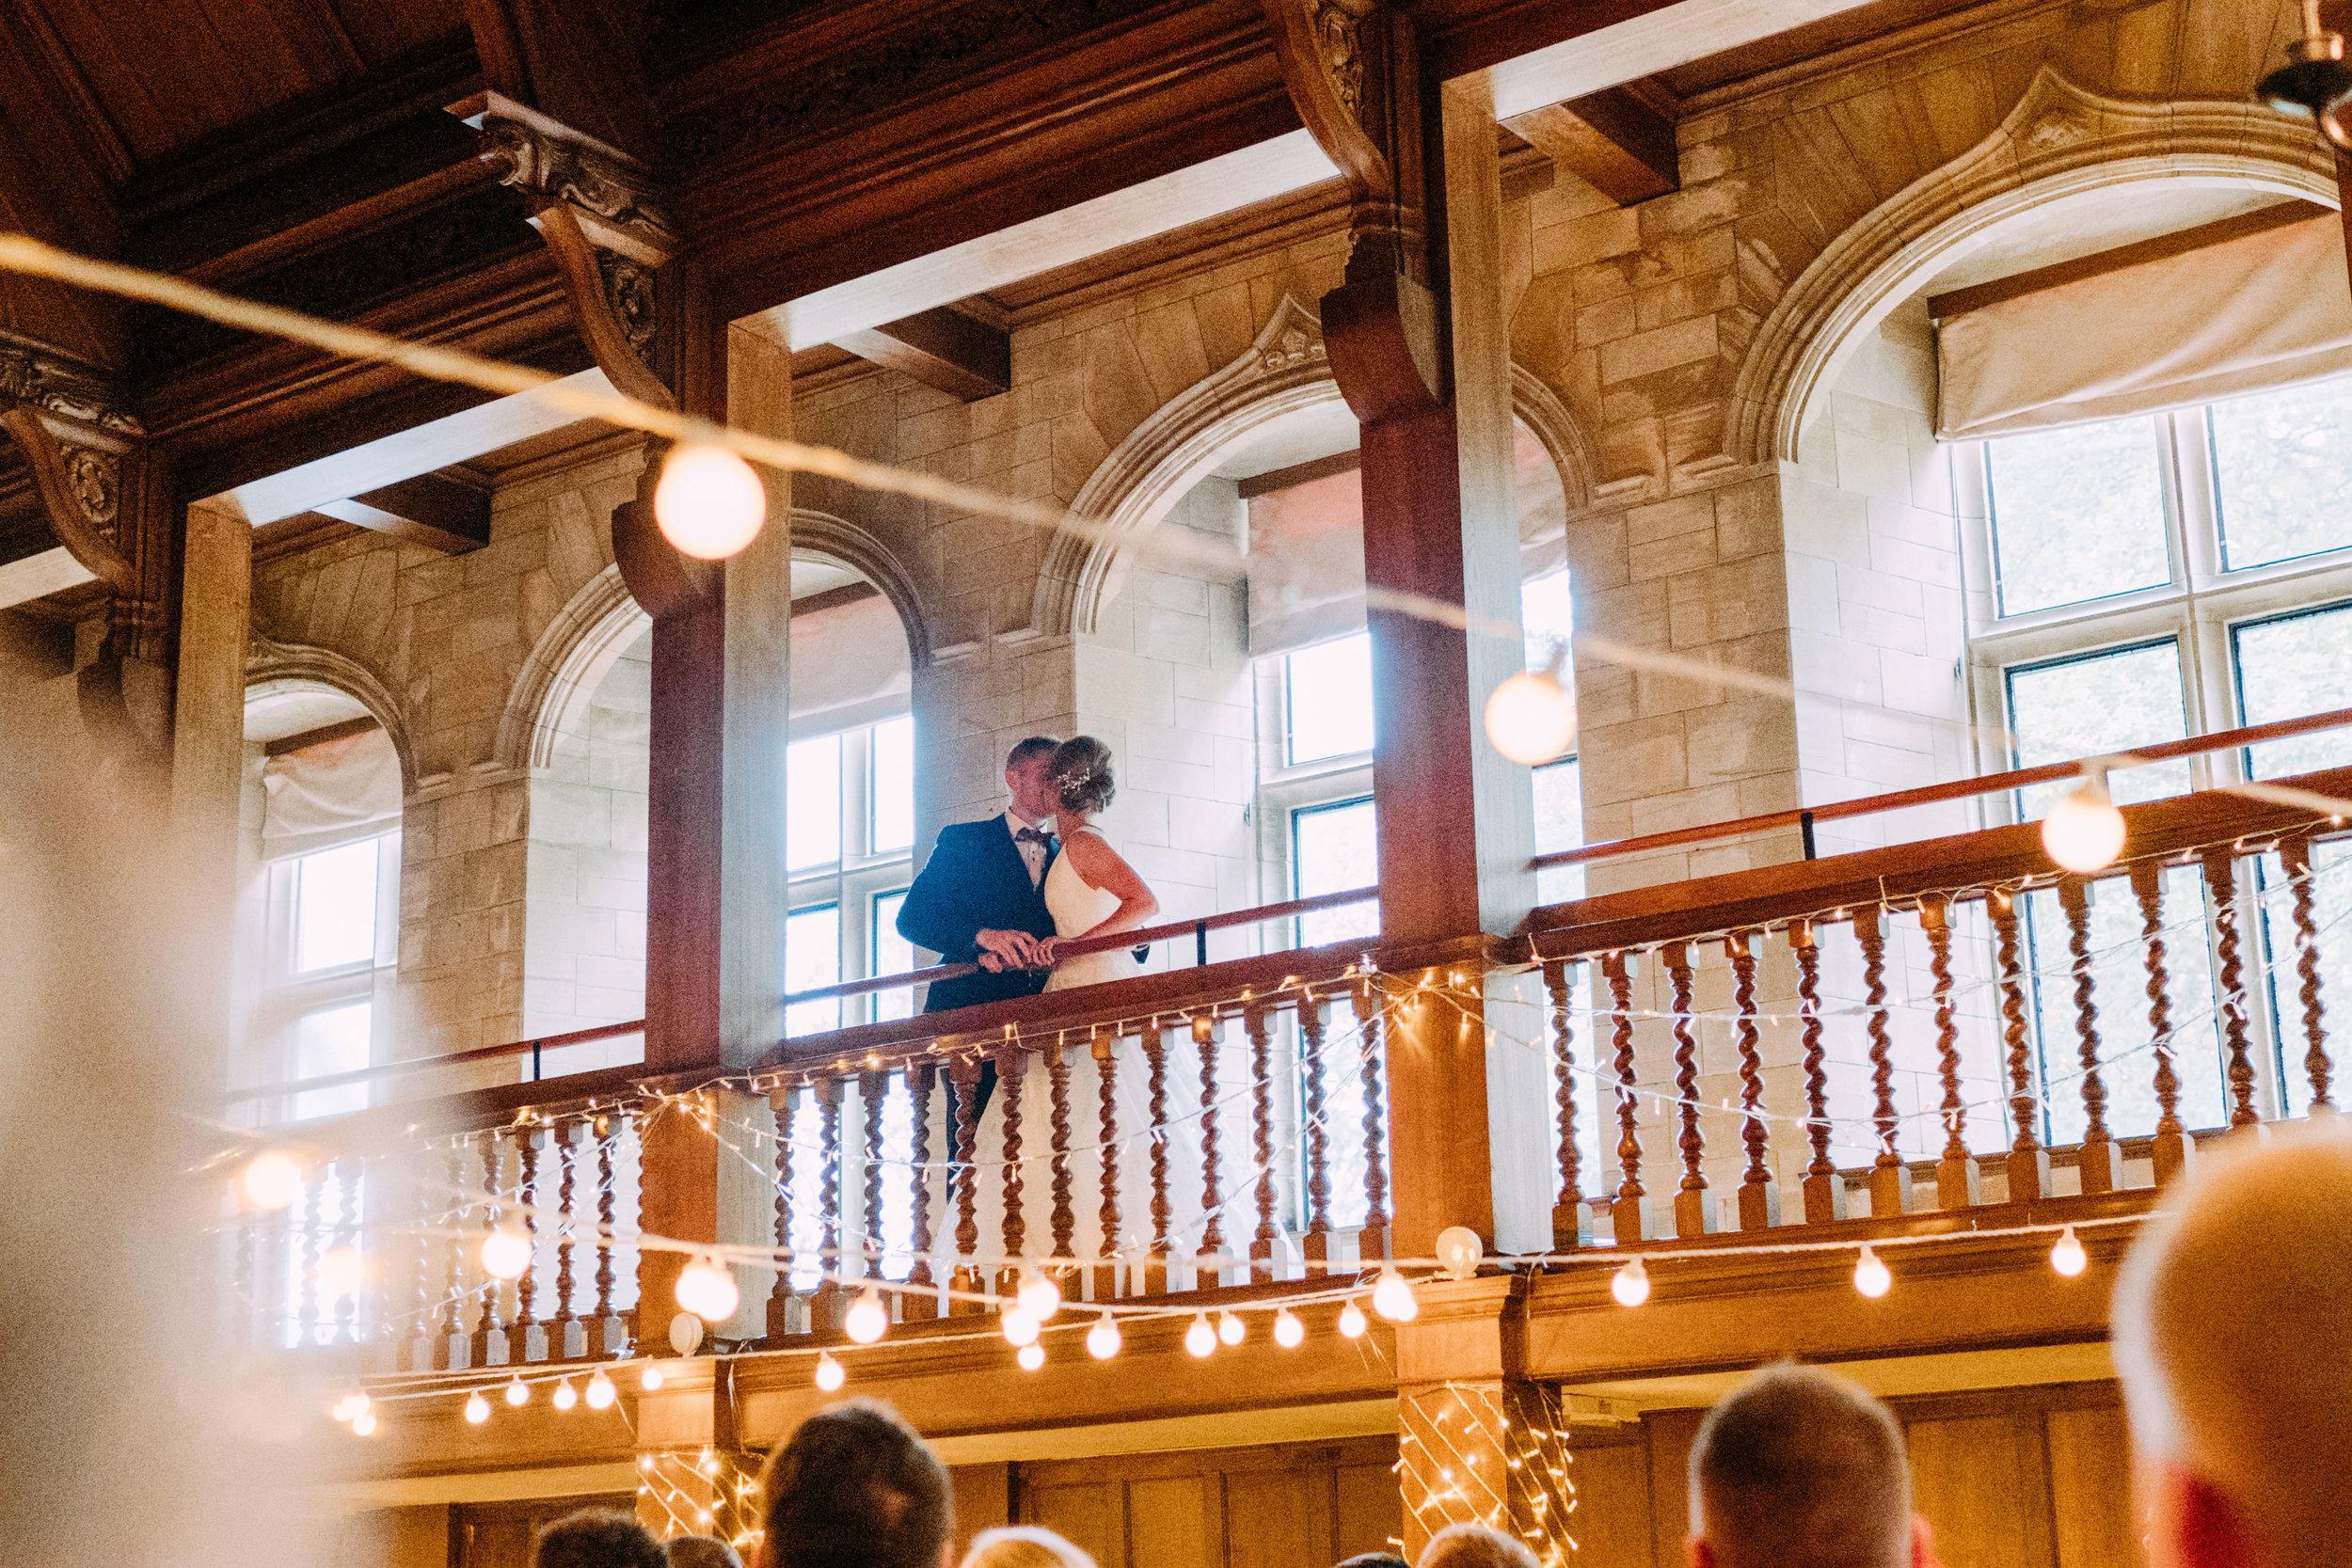 Karin_and_Shauns_Wedding_-_Achnagairn_Castle_-_www.eilidhrobertson.co.uk-1108.jpg